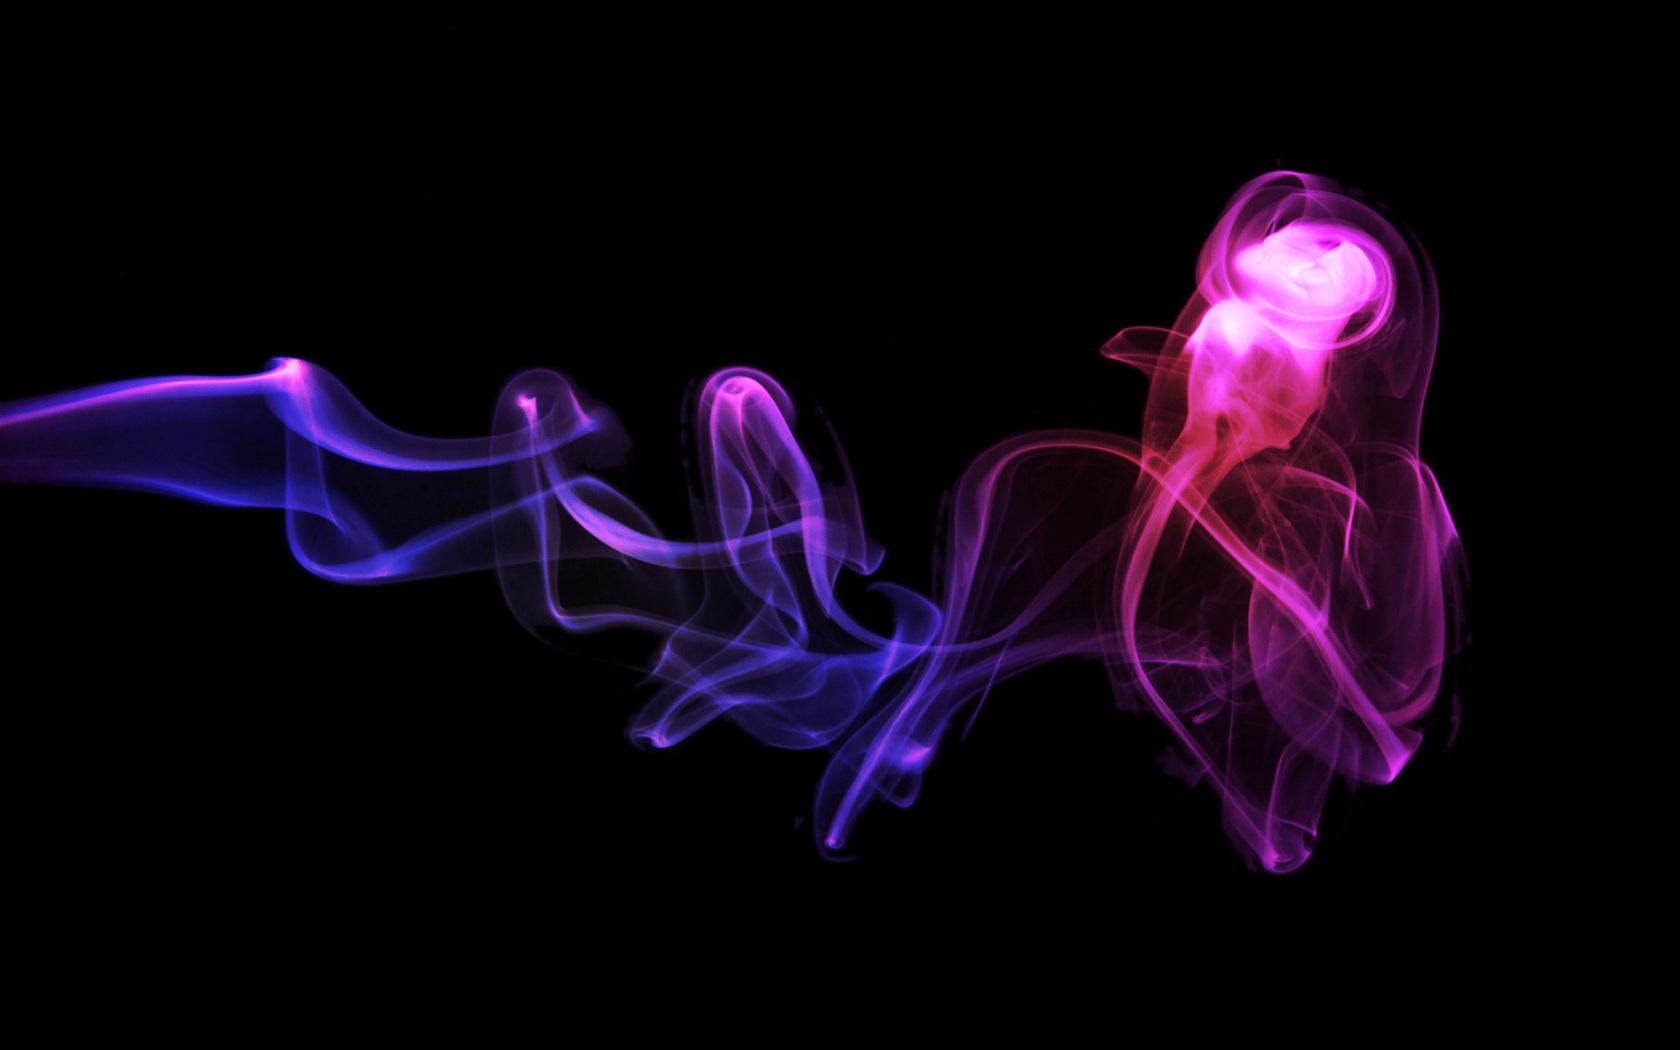 Smoke29348795 - Smoke - Smoke, abstract